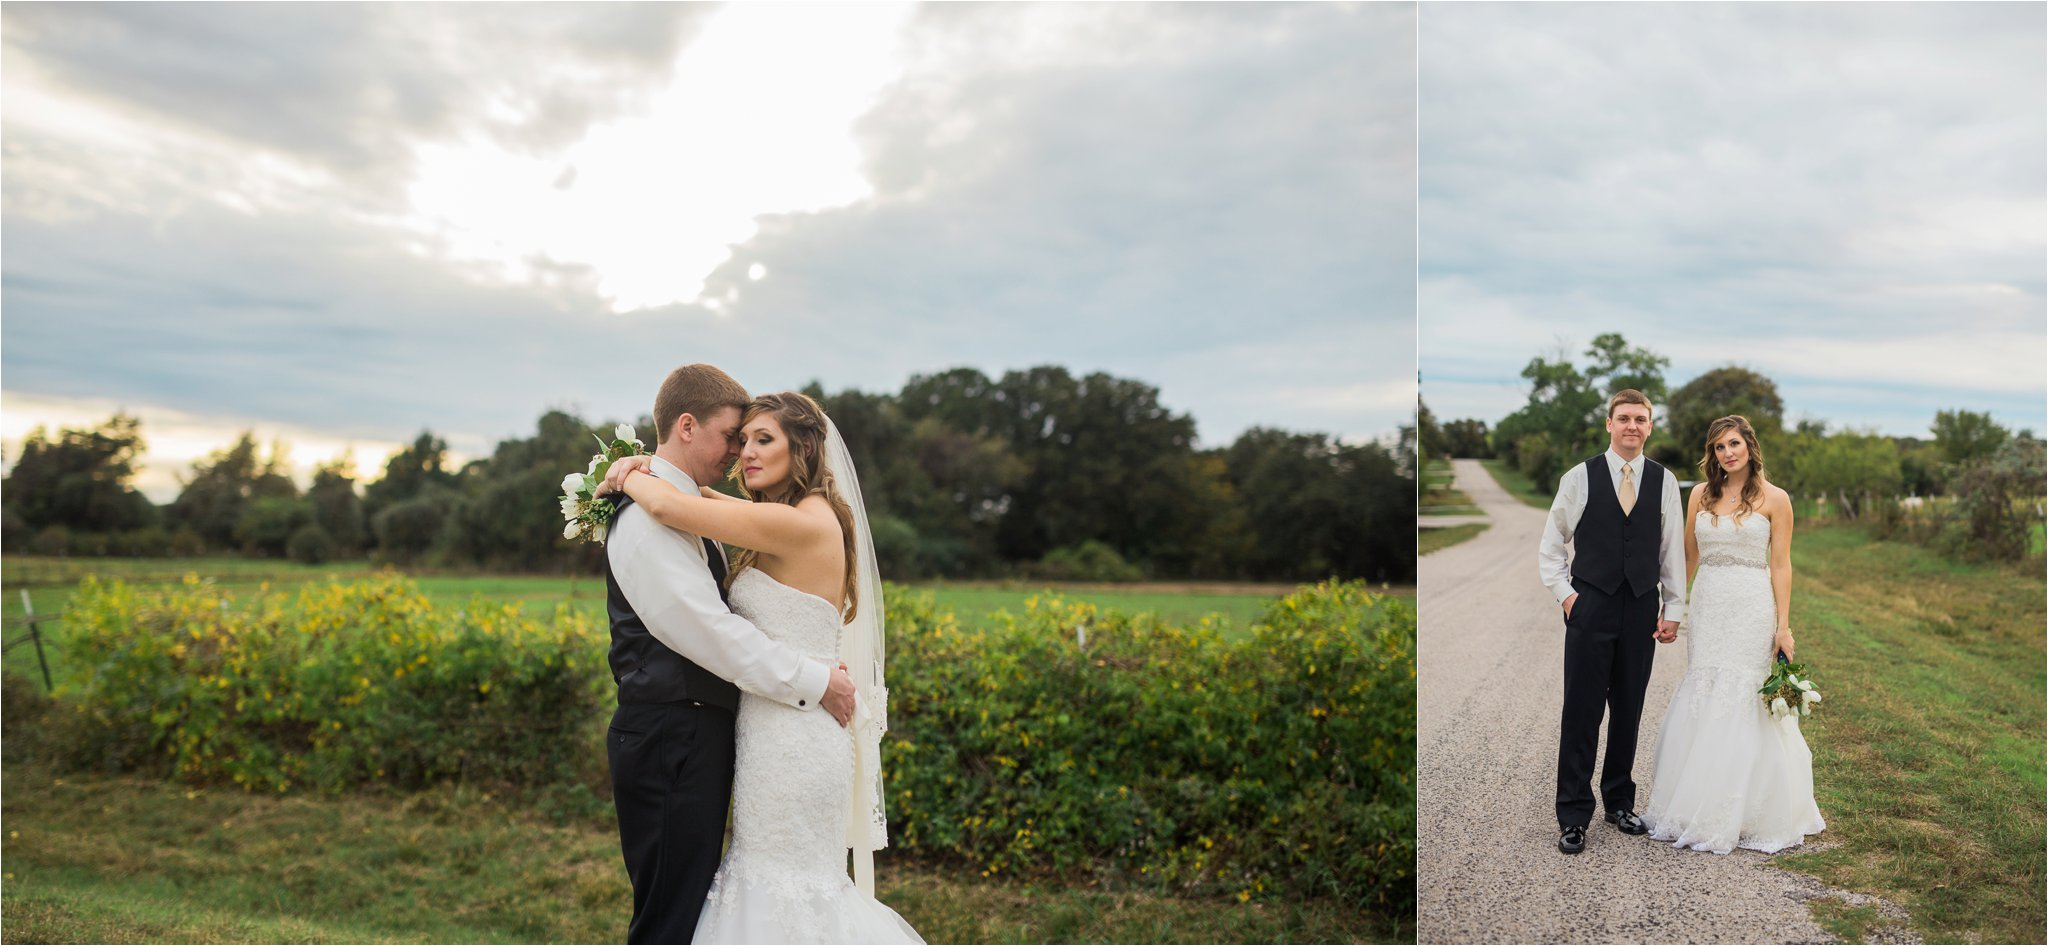 lunsford-wedding-726.jpg